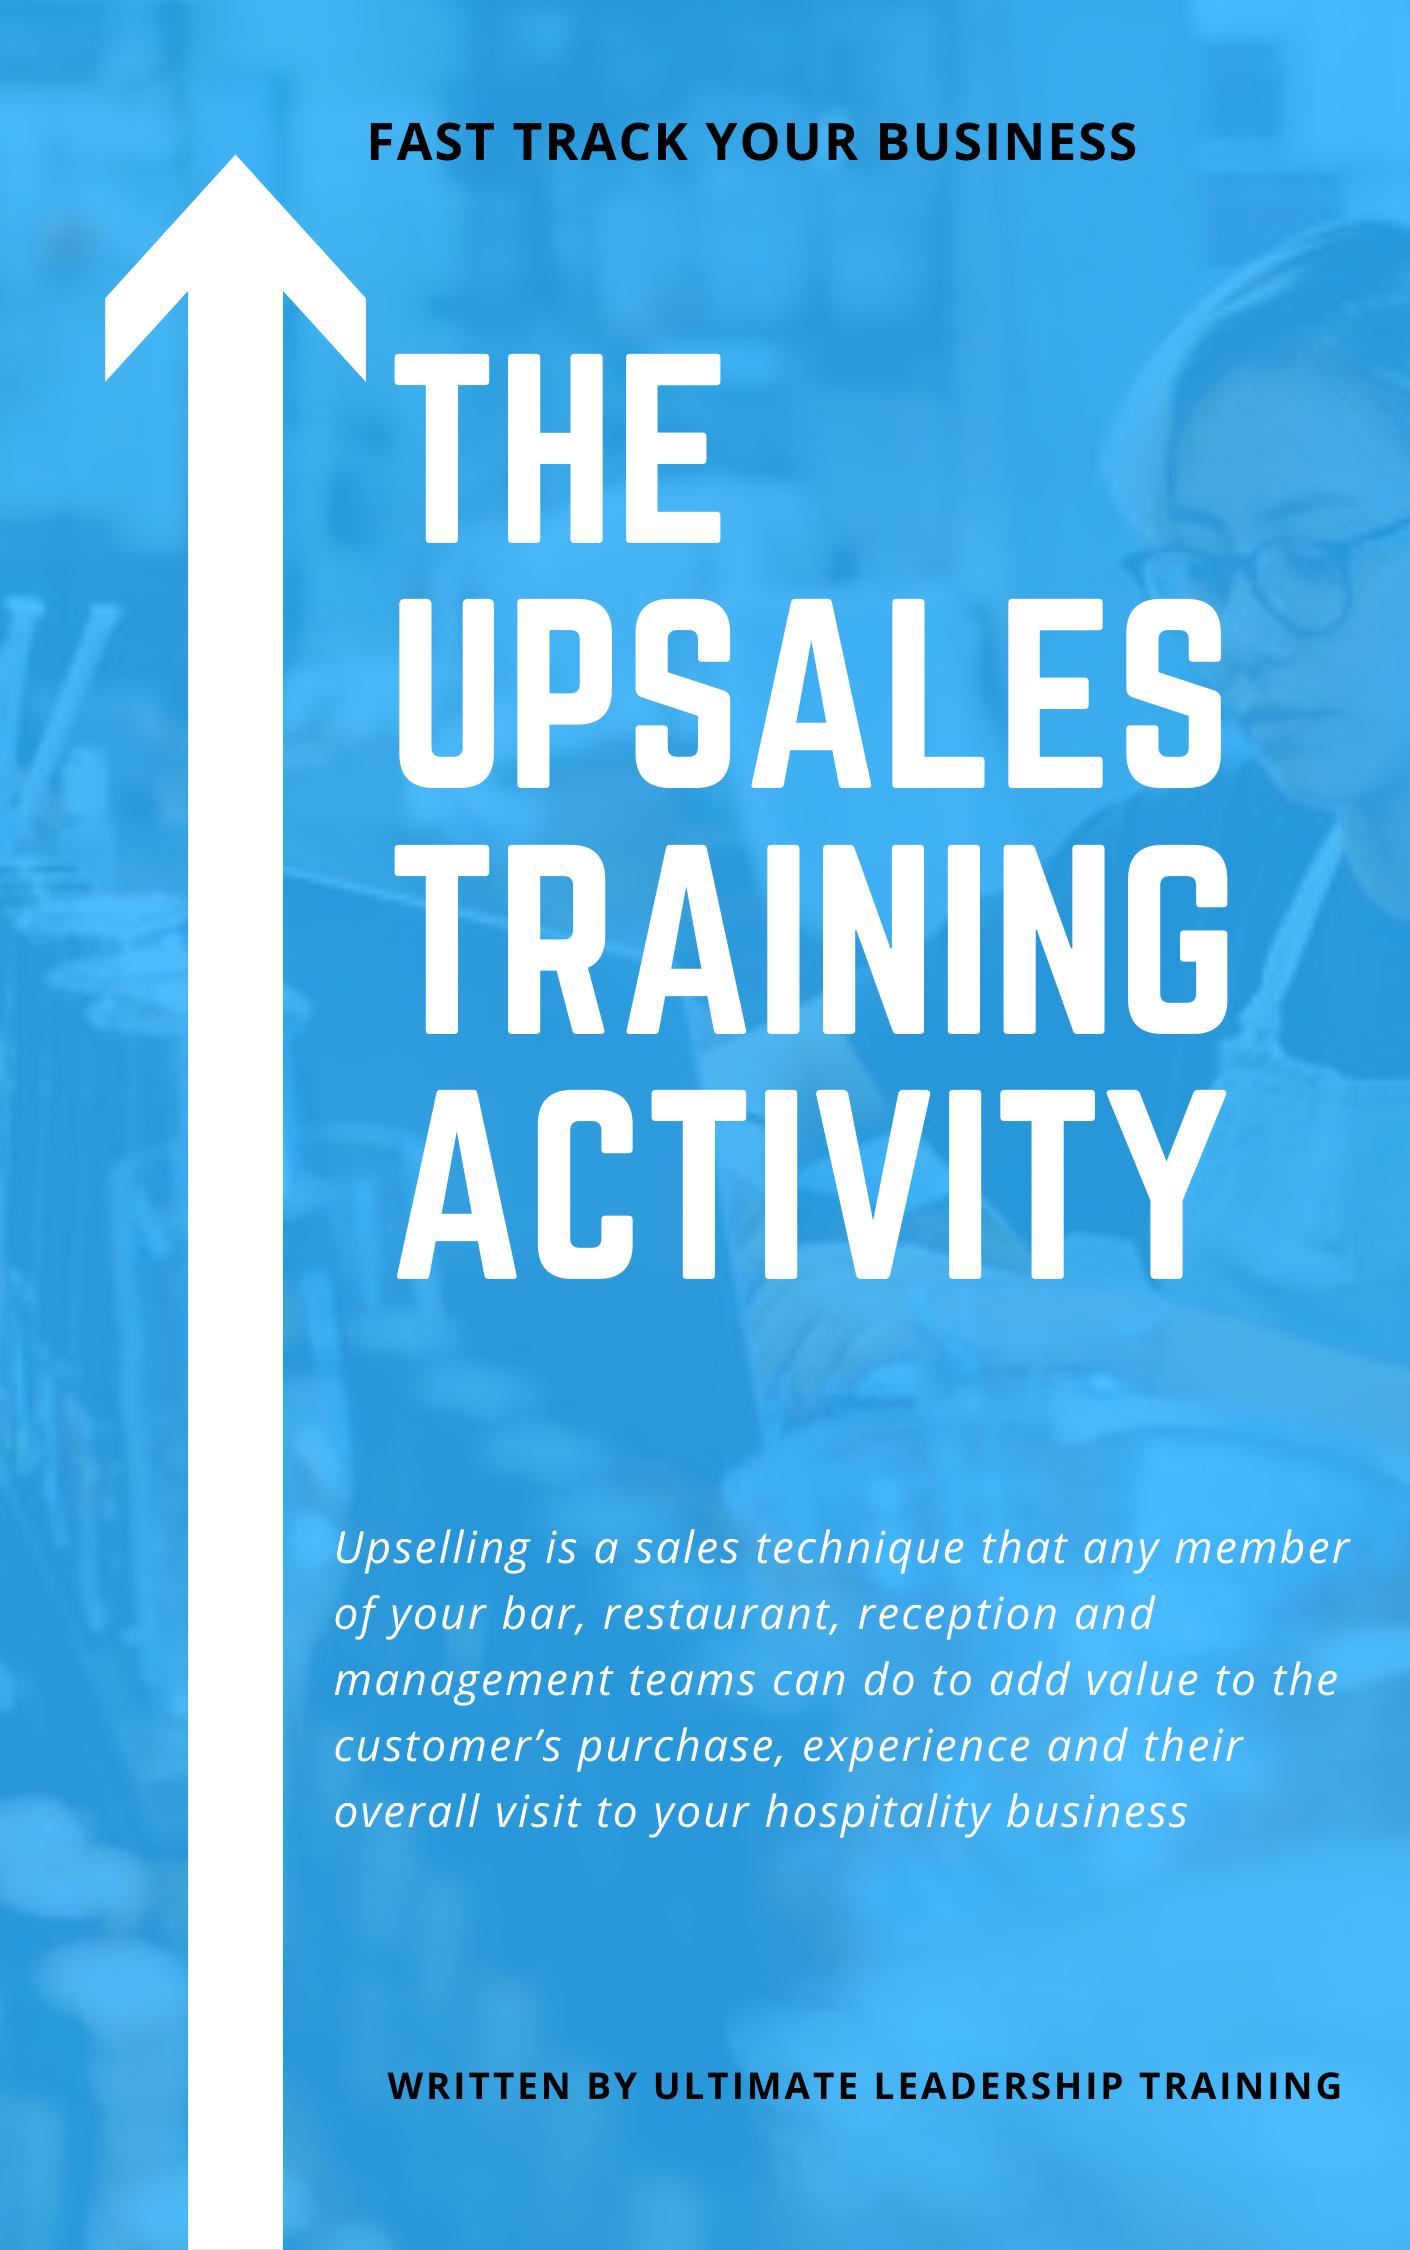 Upselling and upsales training activity to improve your pub restaurant or hotel - hospitality upsales training activity